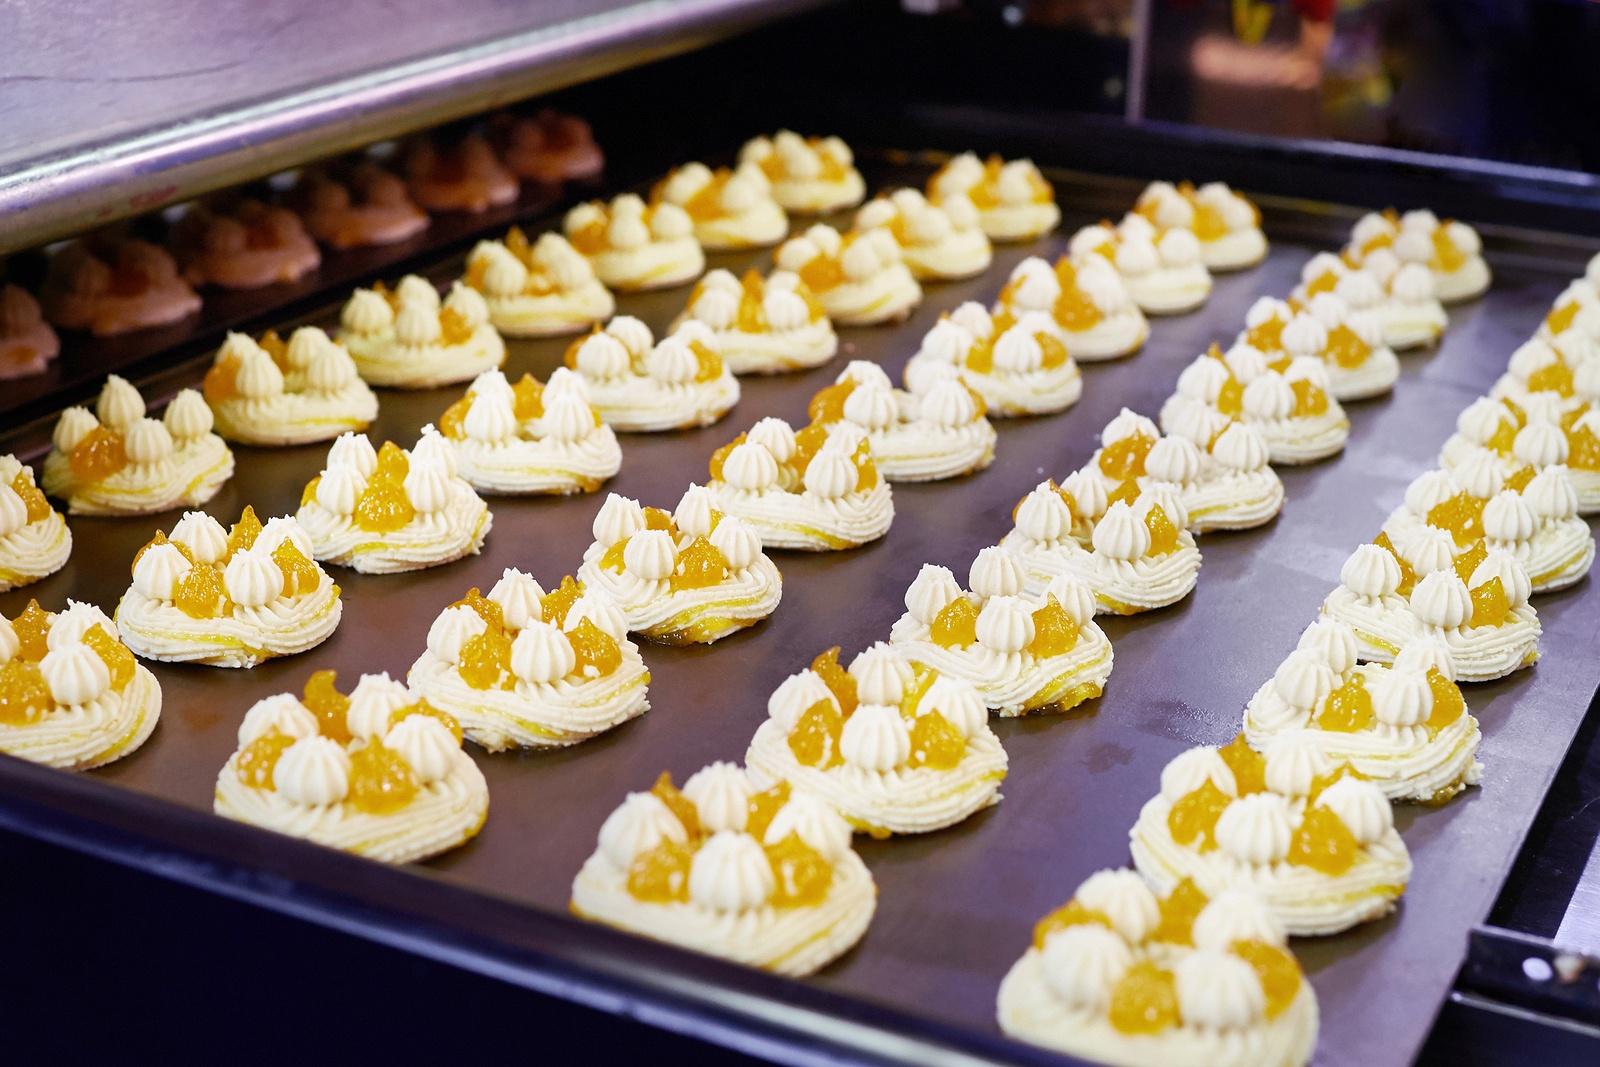 dessert in a factory